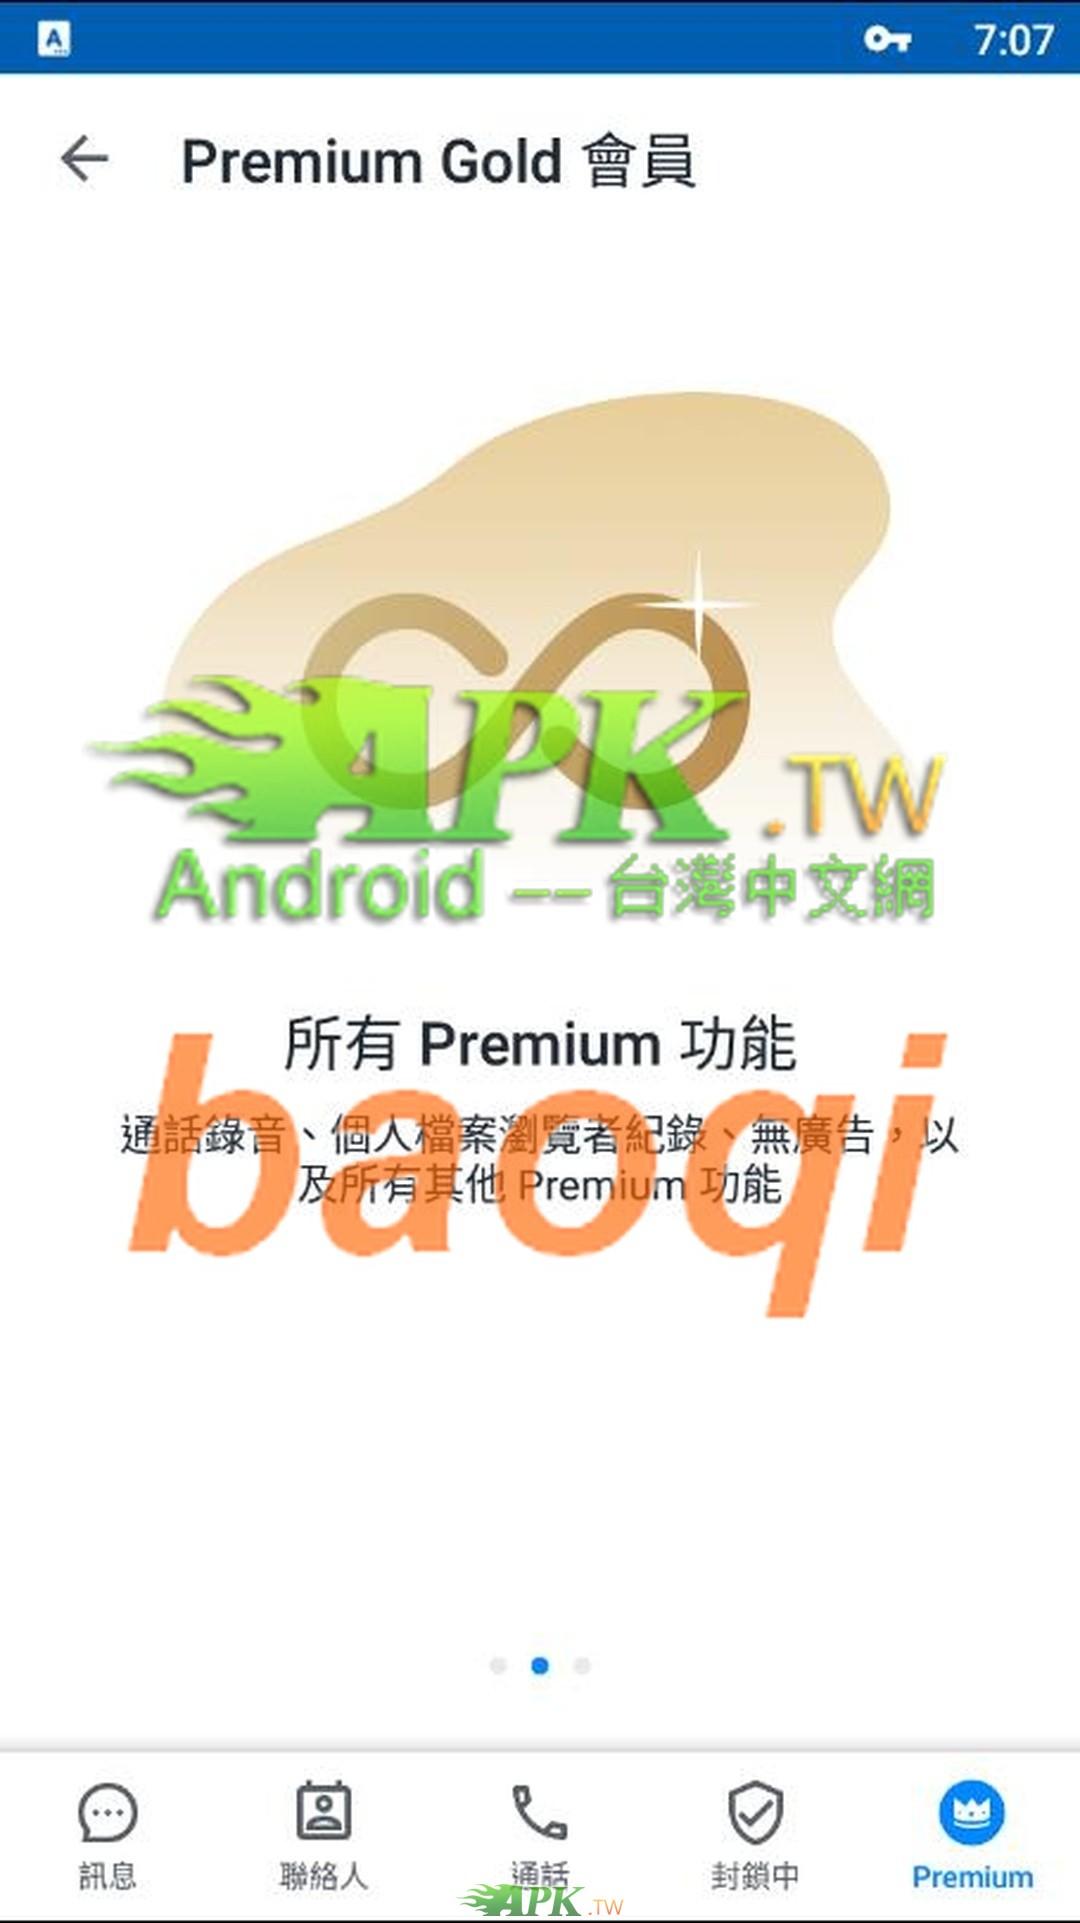 Truecaller_Premium_4_Gold_.jpg